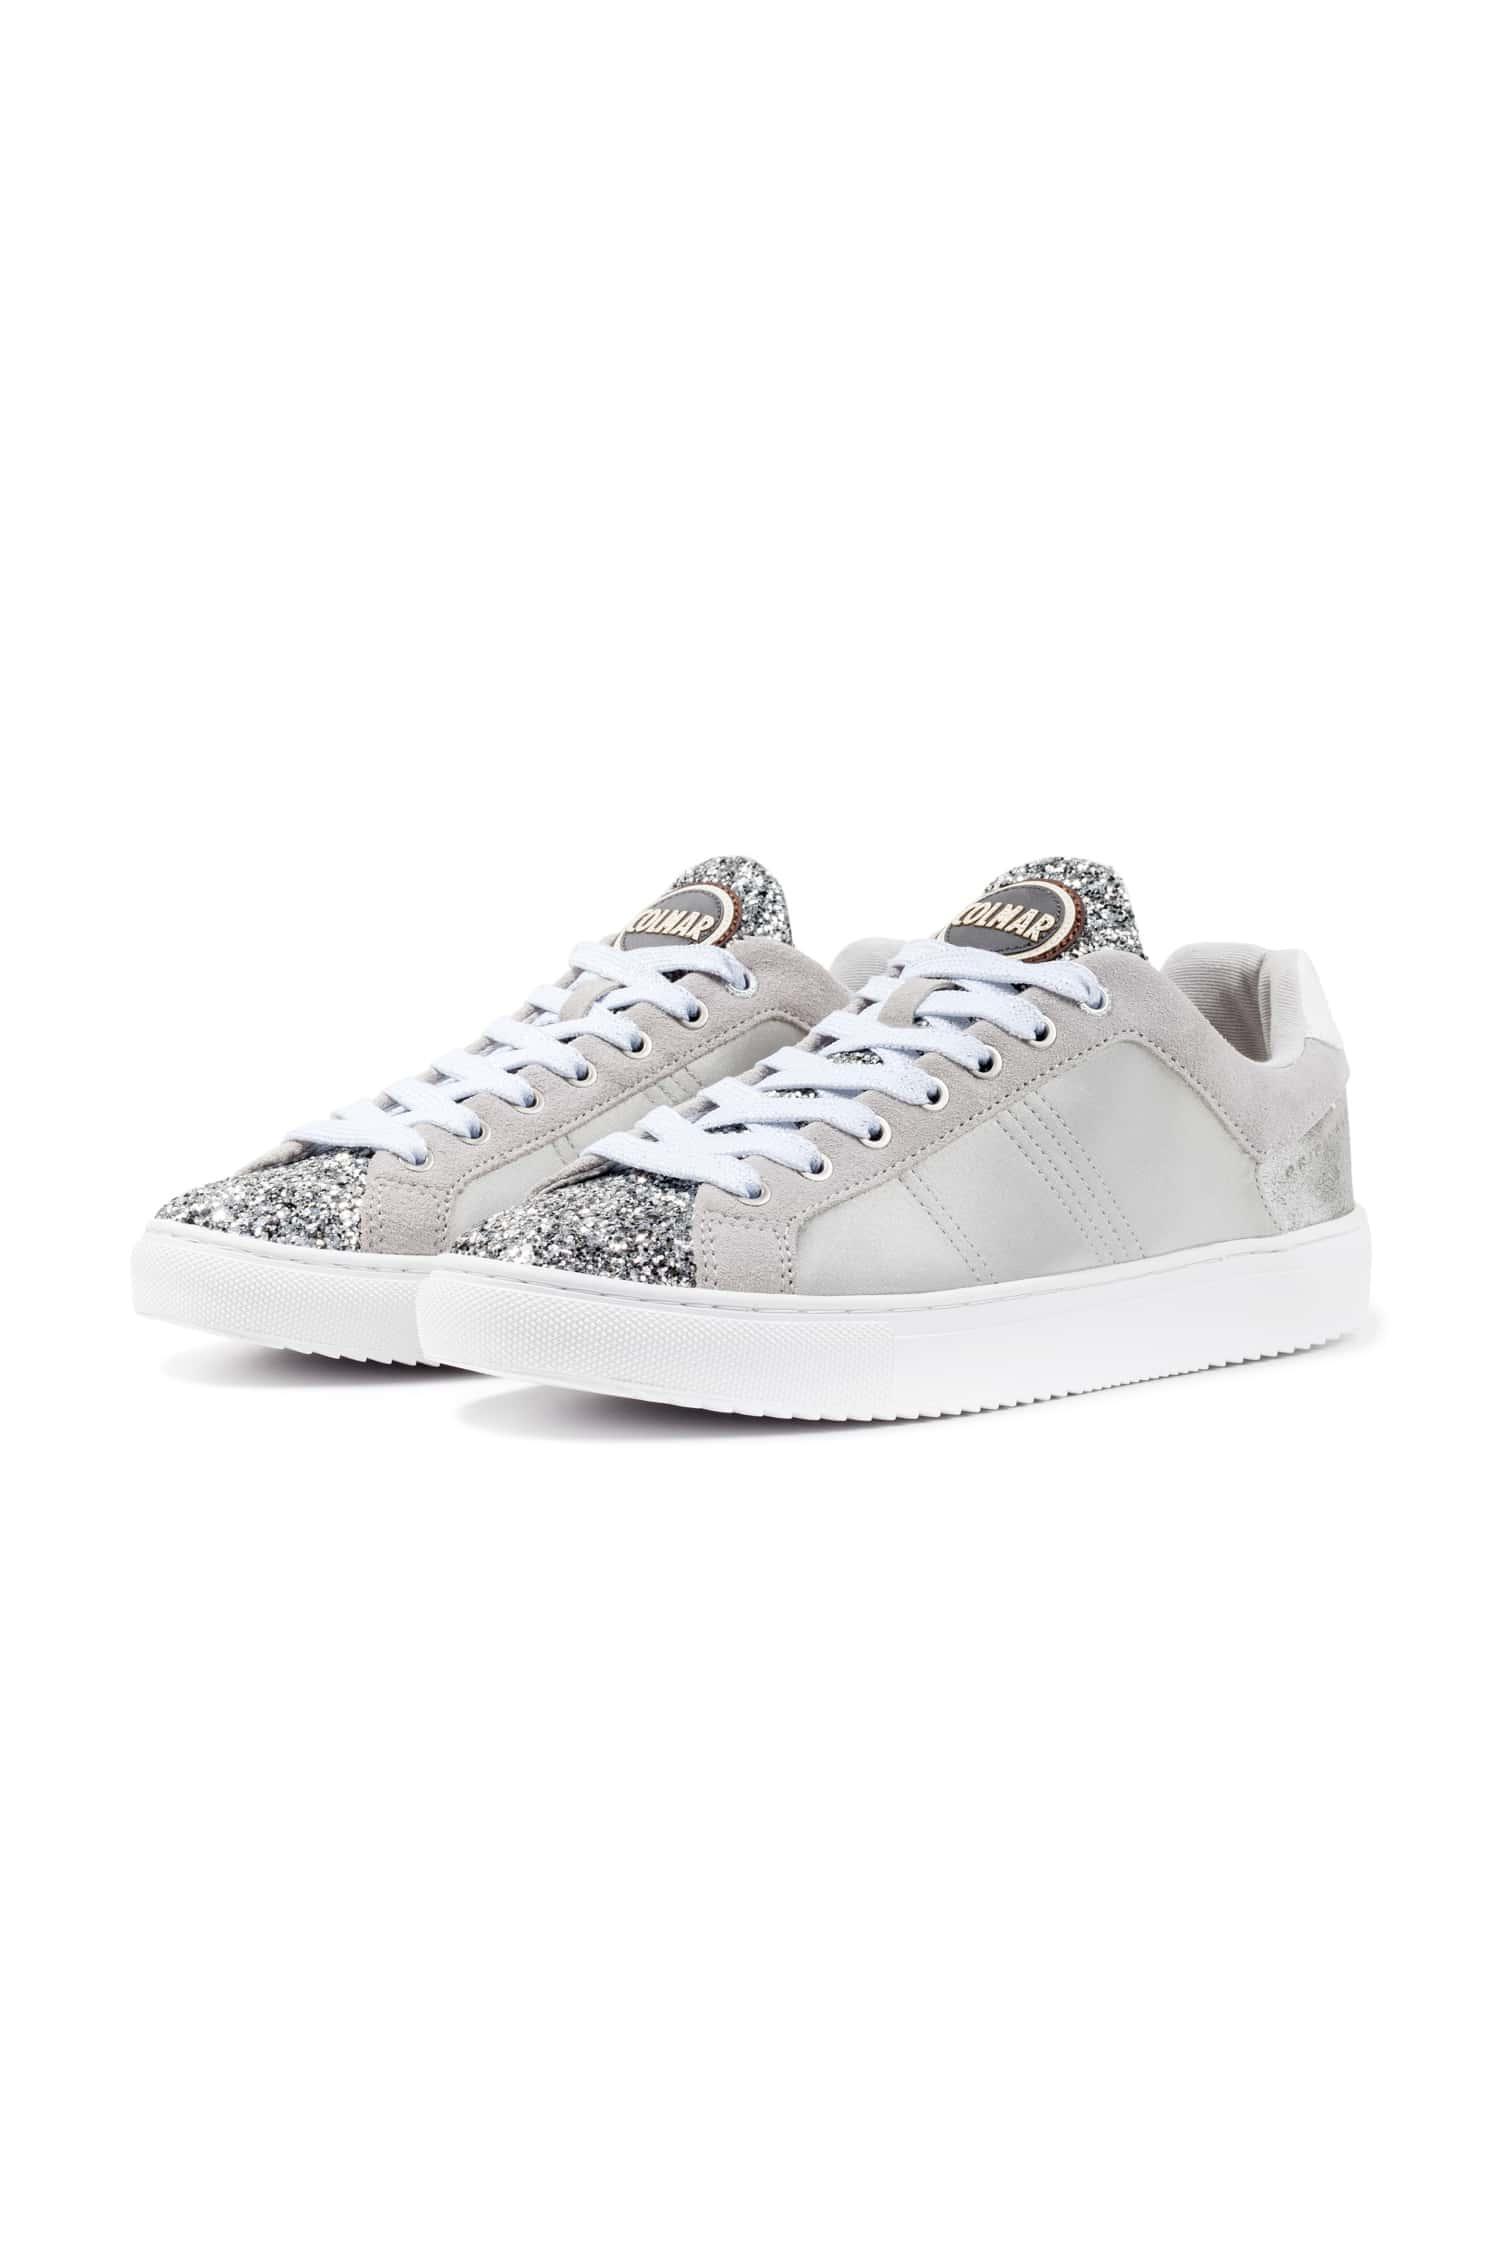 hot sale online f162b 2e8df Colmar Sneakers Bradbury Trend